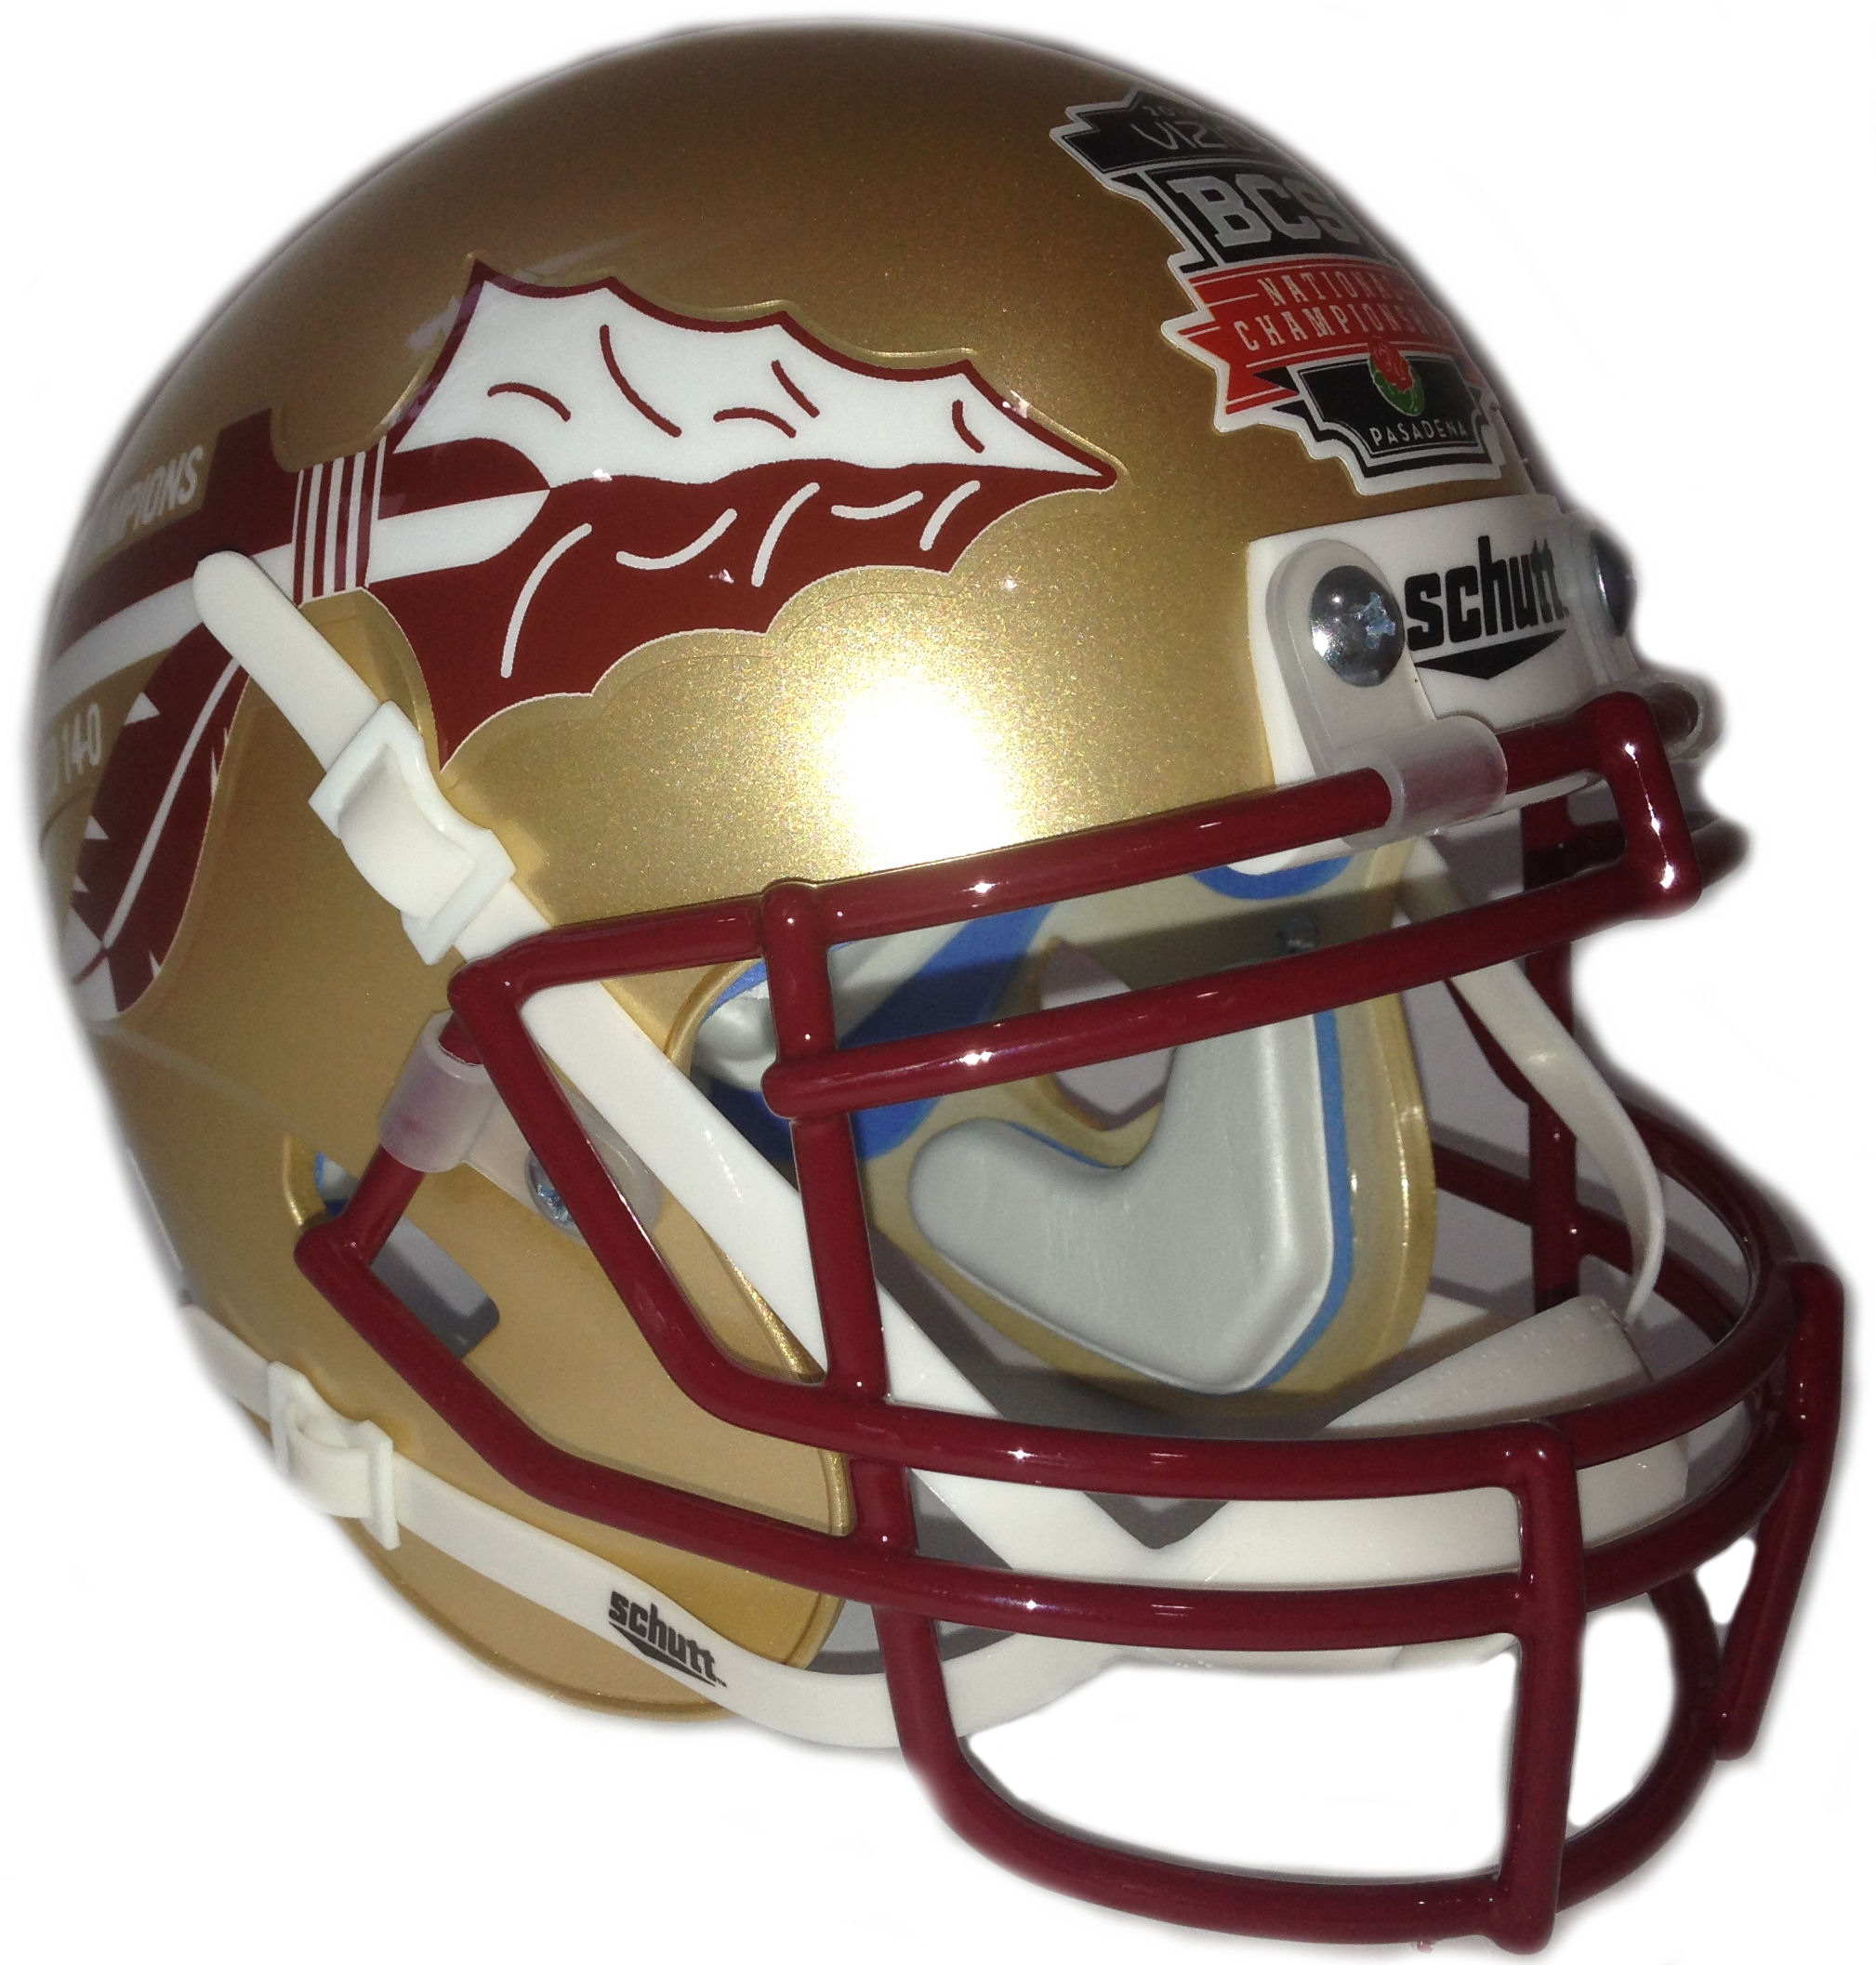 Florida State Seminoles 2013 BCS National Champions Replica Football Helmet Schutt